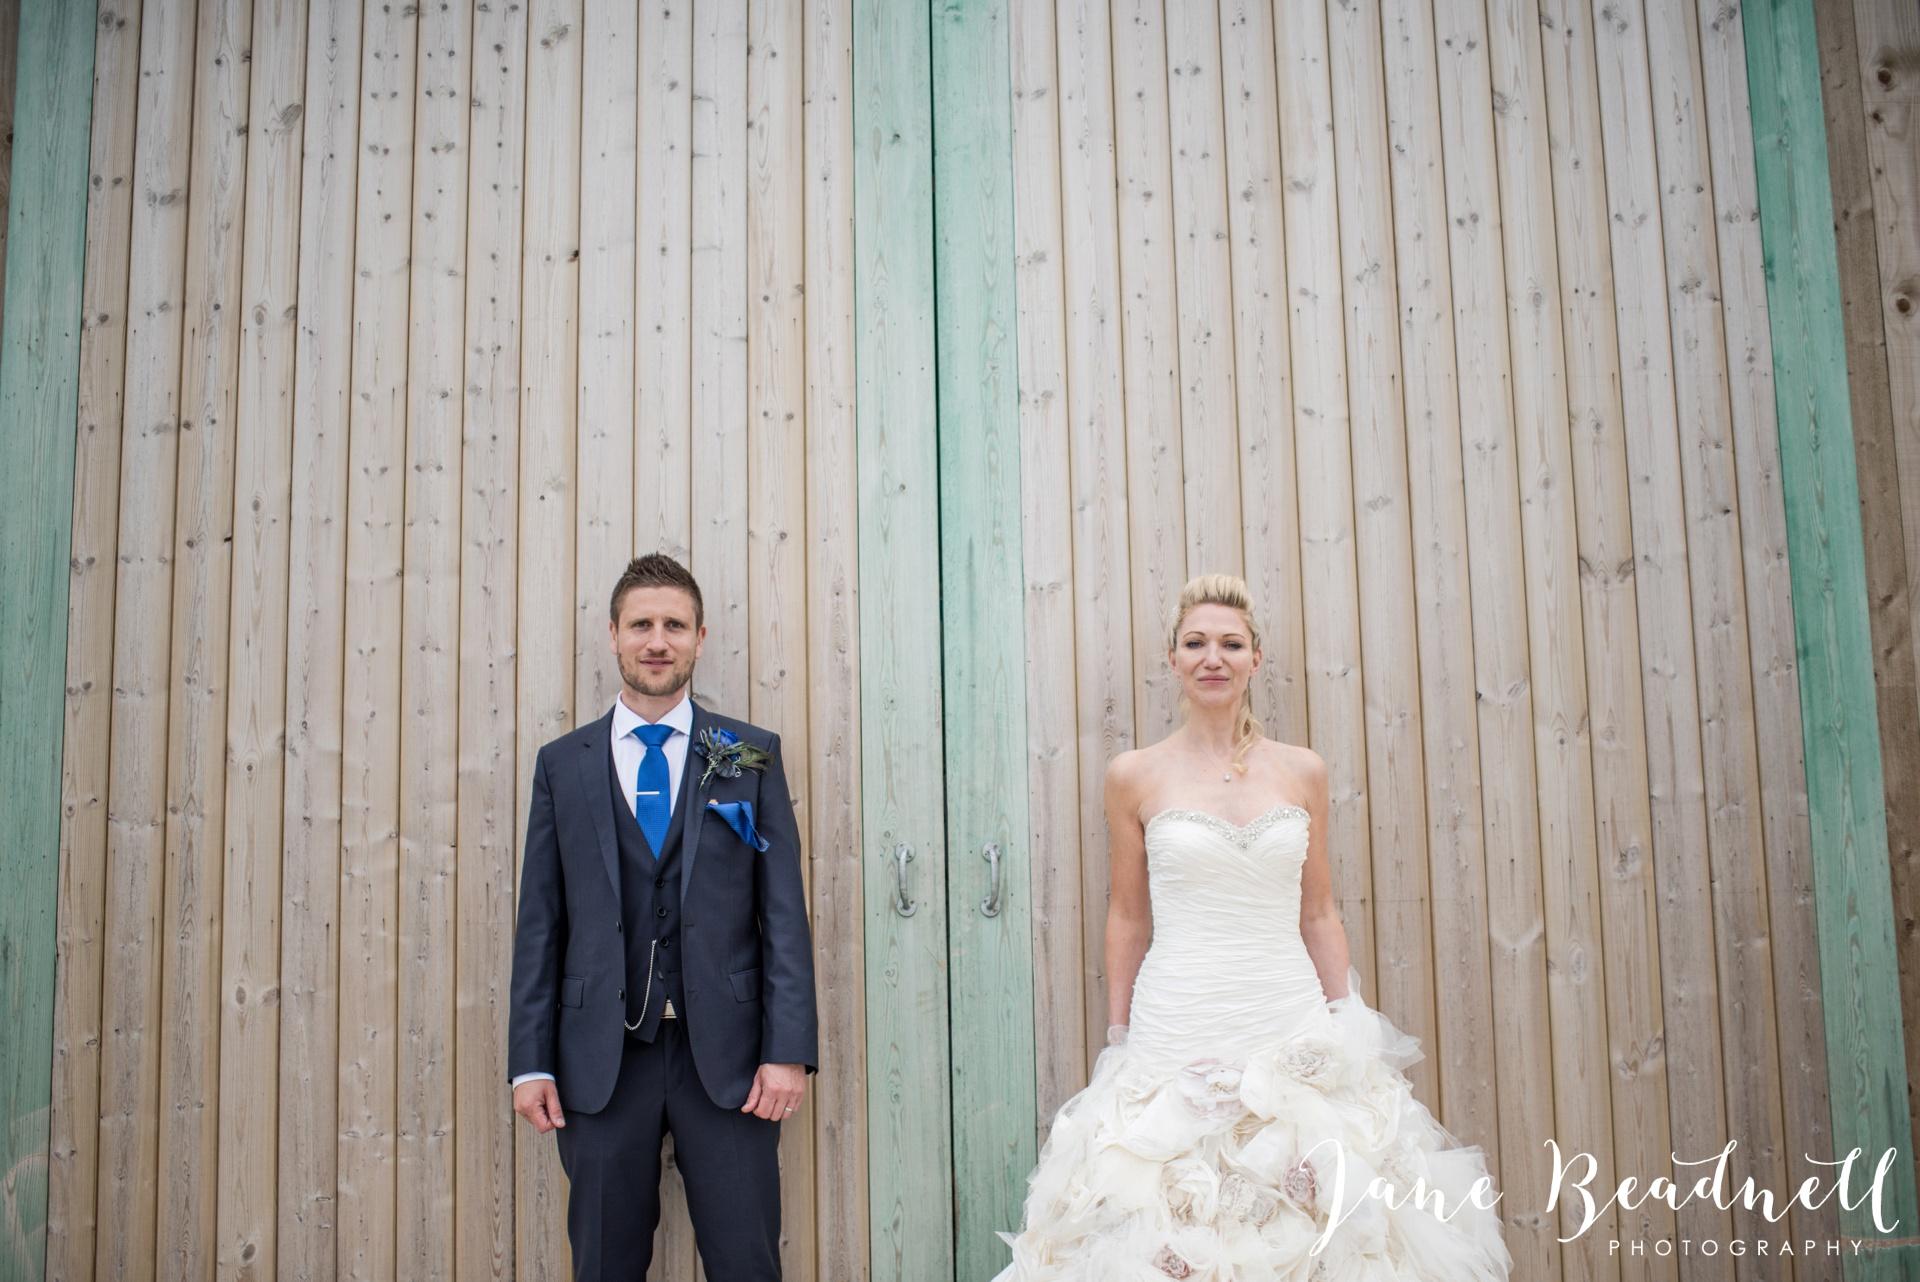 Hill Top Farm Wedding Photography Masham by Jane Beadnell Photography_0069